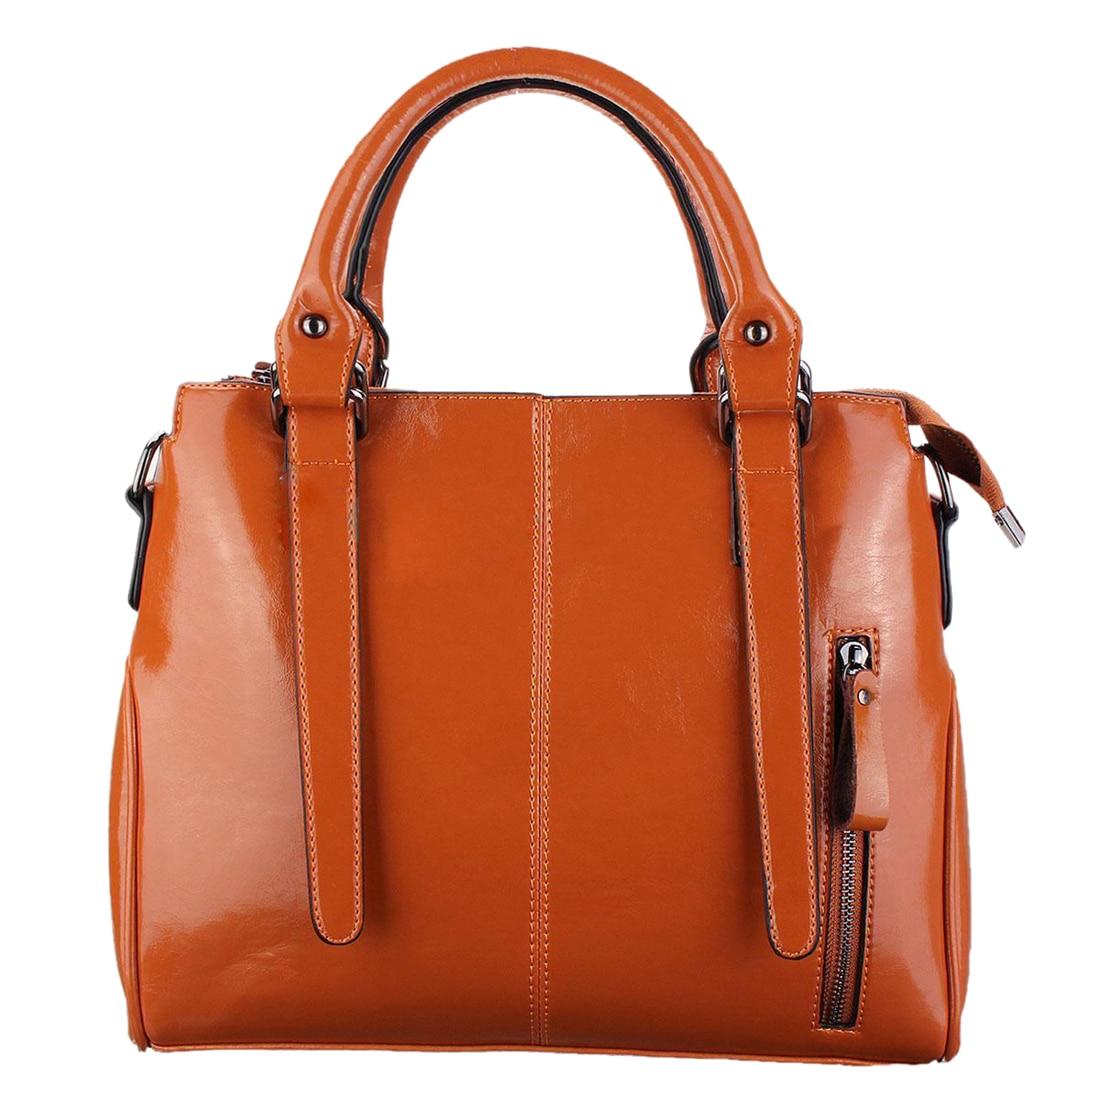 8 Pcs of (Women Leather Handbag Shoulder Bag Tote Messenger Crossbody Bag Ladies Satchel Purse Brown Convenient storage ) fashion women handbag shoulder bag leather messenger bag satchel tote purse l228